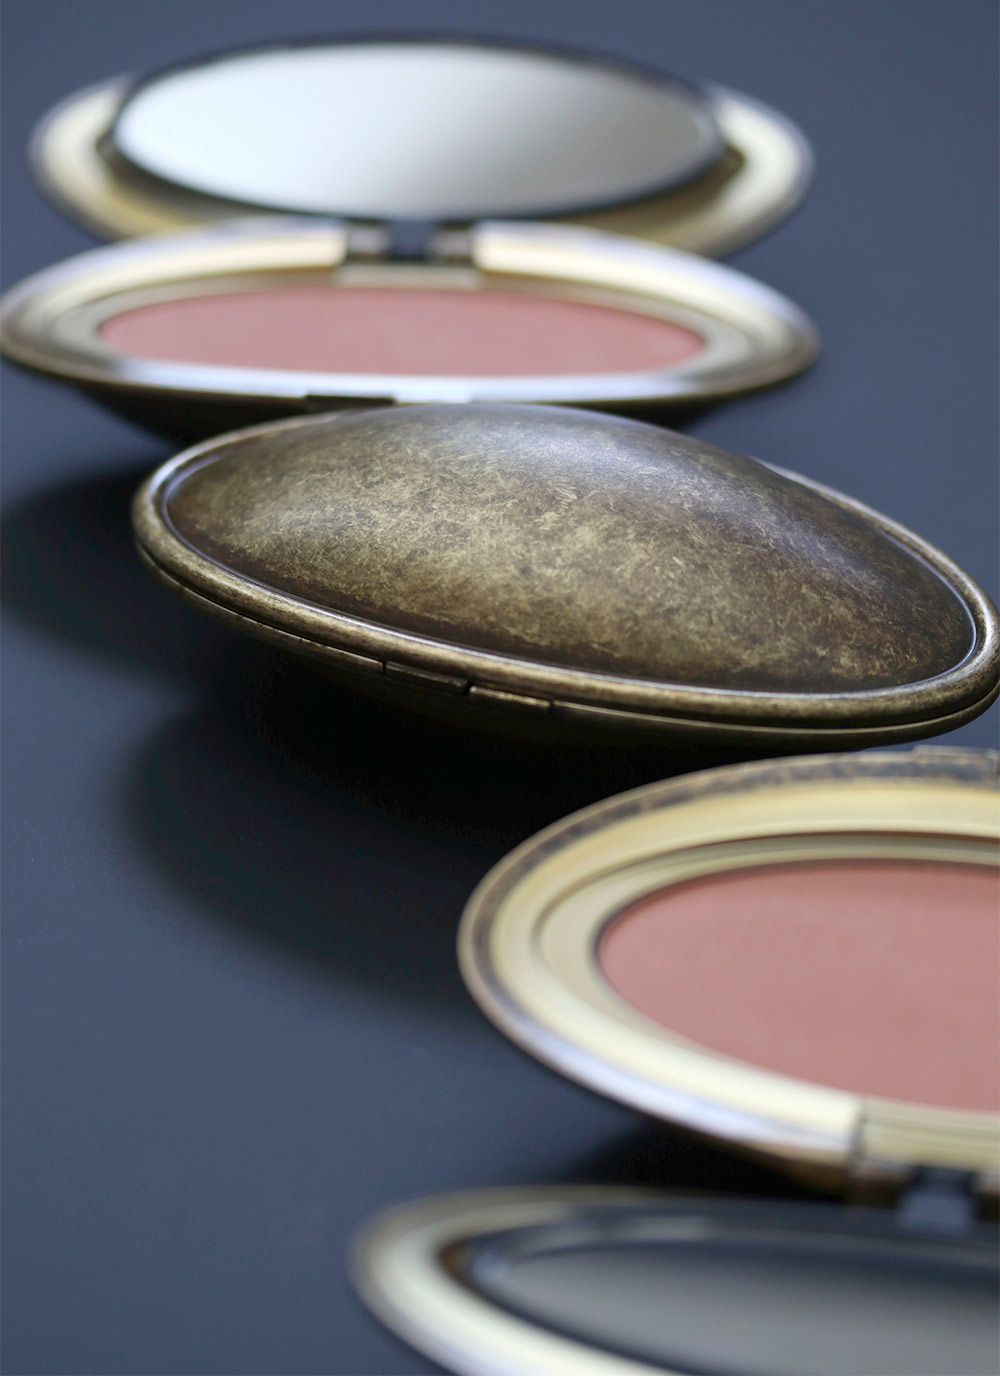 mac robert lee morris powder blush packaging 1